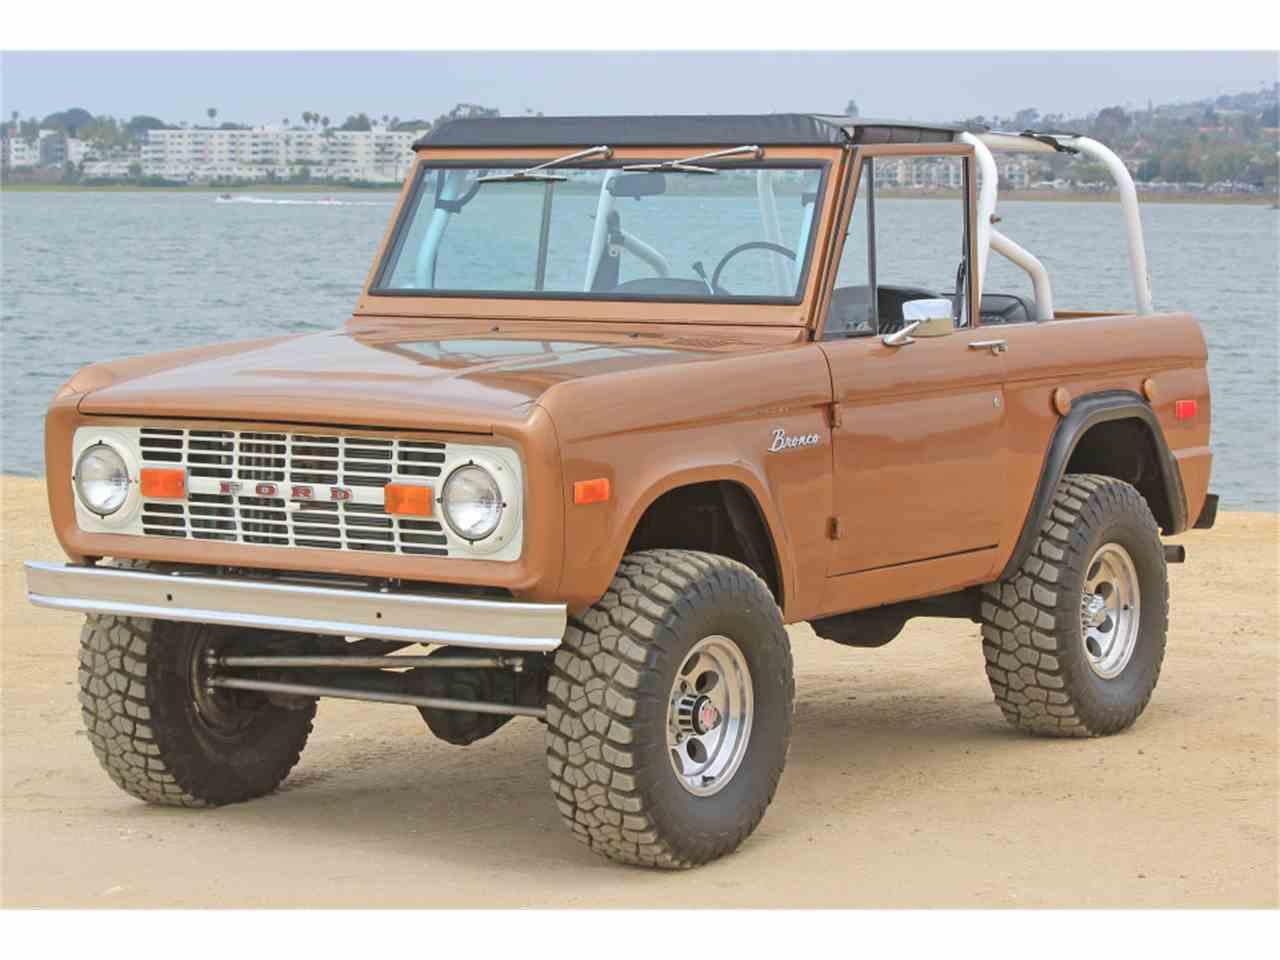 Atemberaubend 78 Ford Bronco Schaltplan Ideen - Schaltplan Serie ...